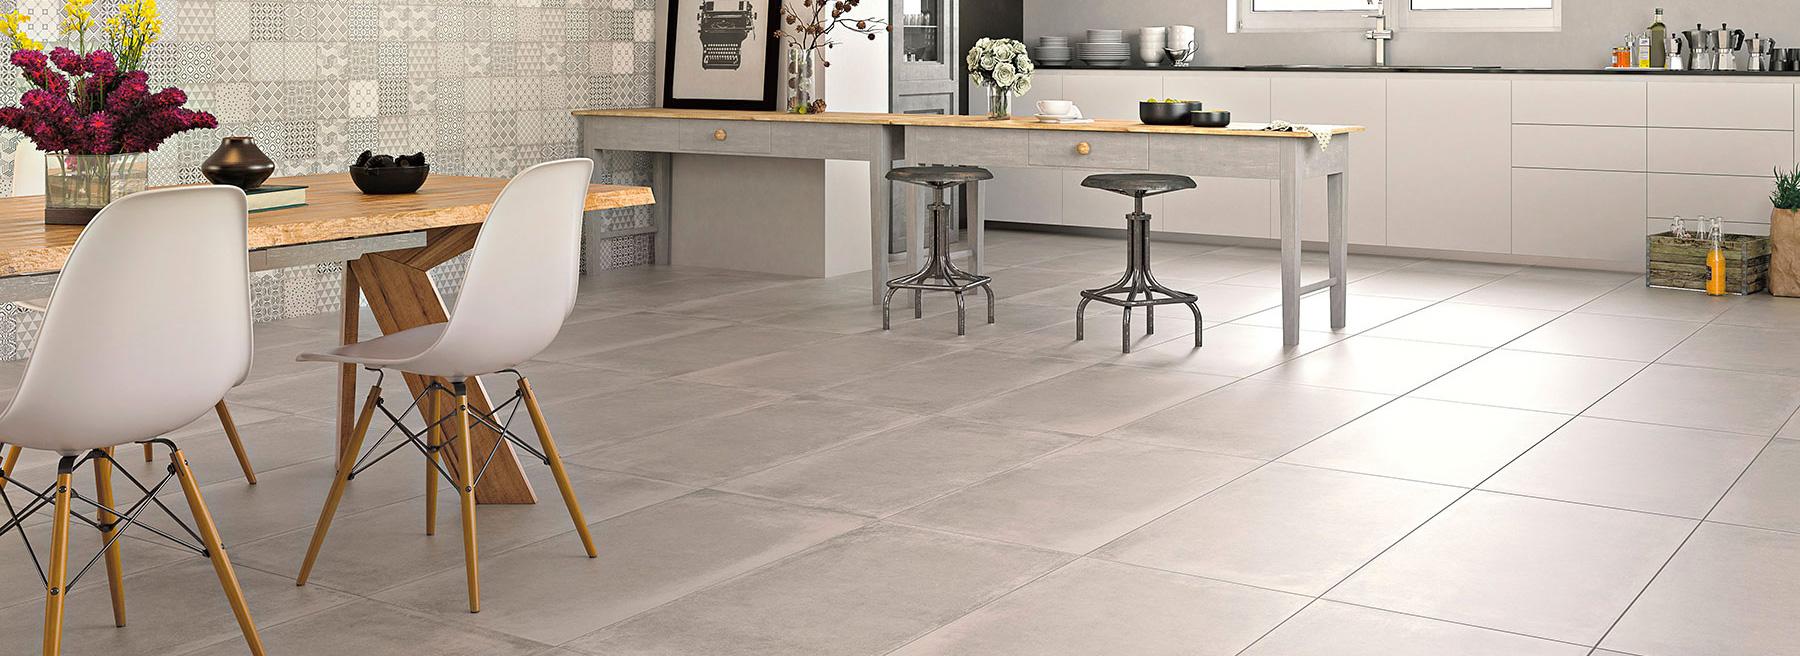 kitchen tiles wall floor tiles